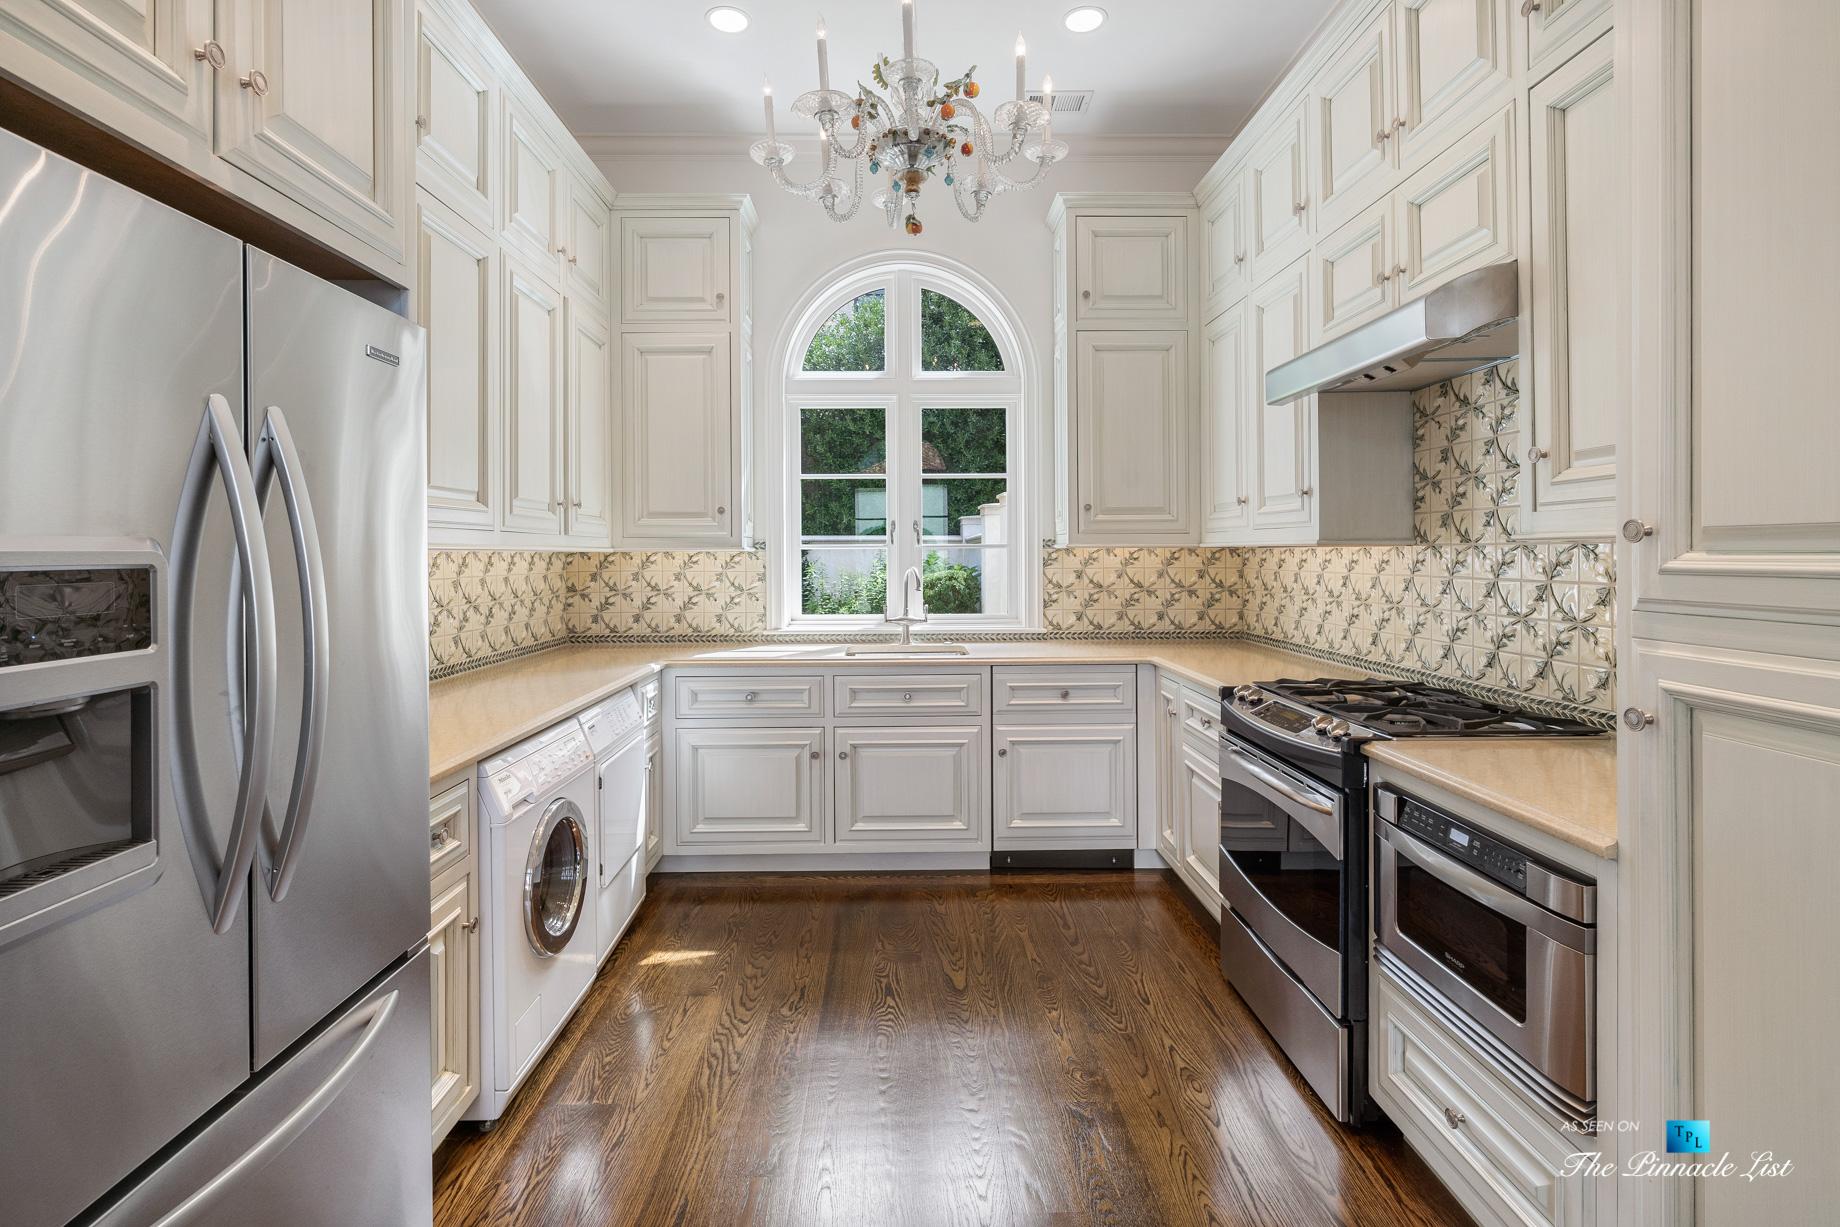 439 Blackland Rd NW, Atlanta, GA, USA – Secondary Kitchen – Luxury Real Estate – Tuxedo Park Mediterranean Mansion Home